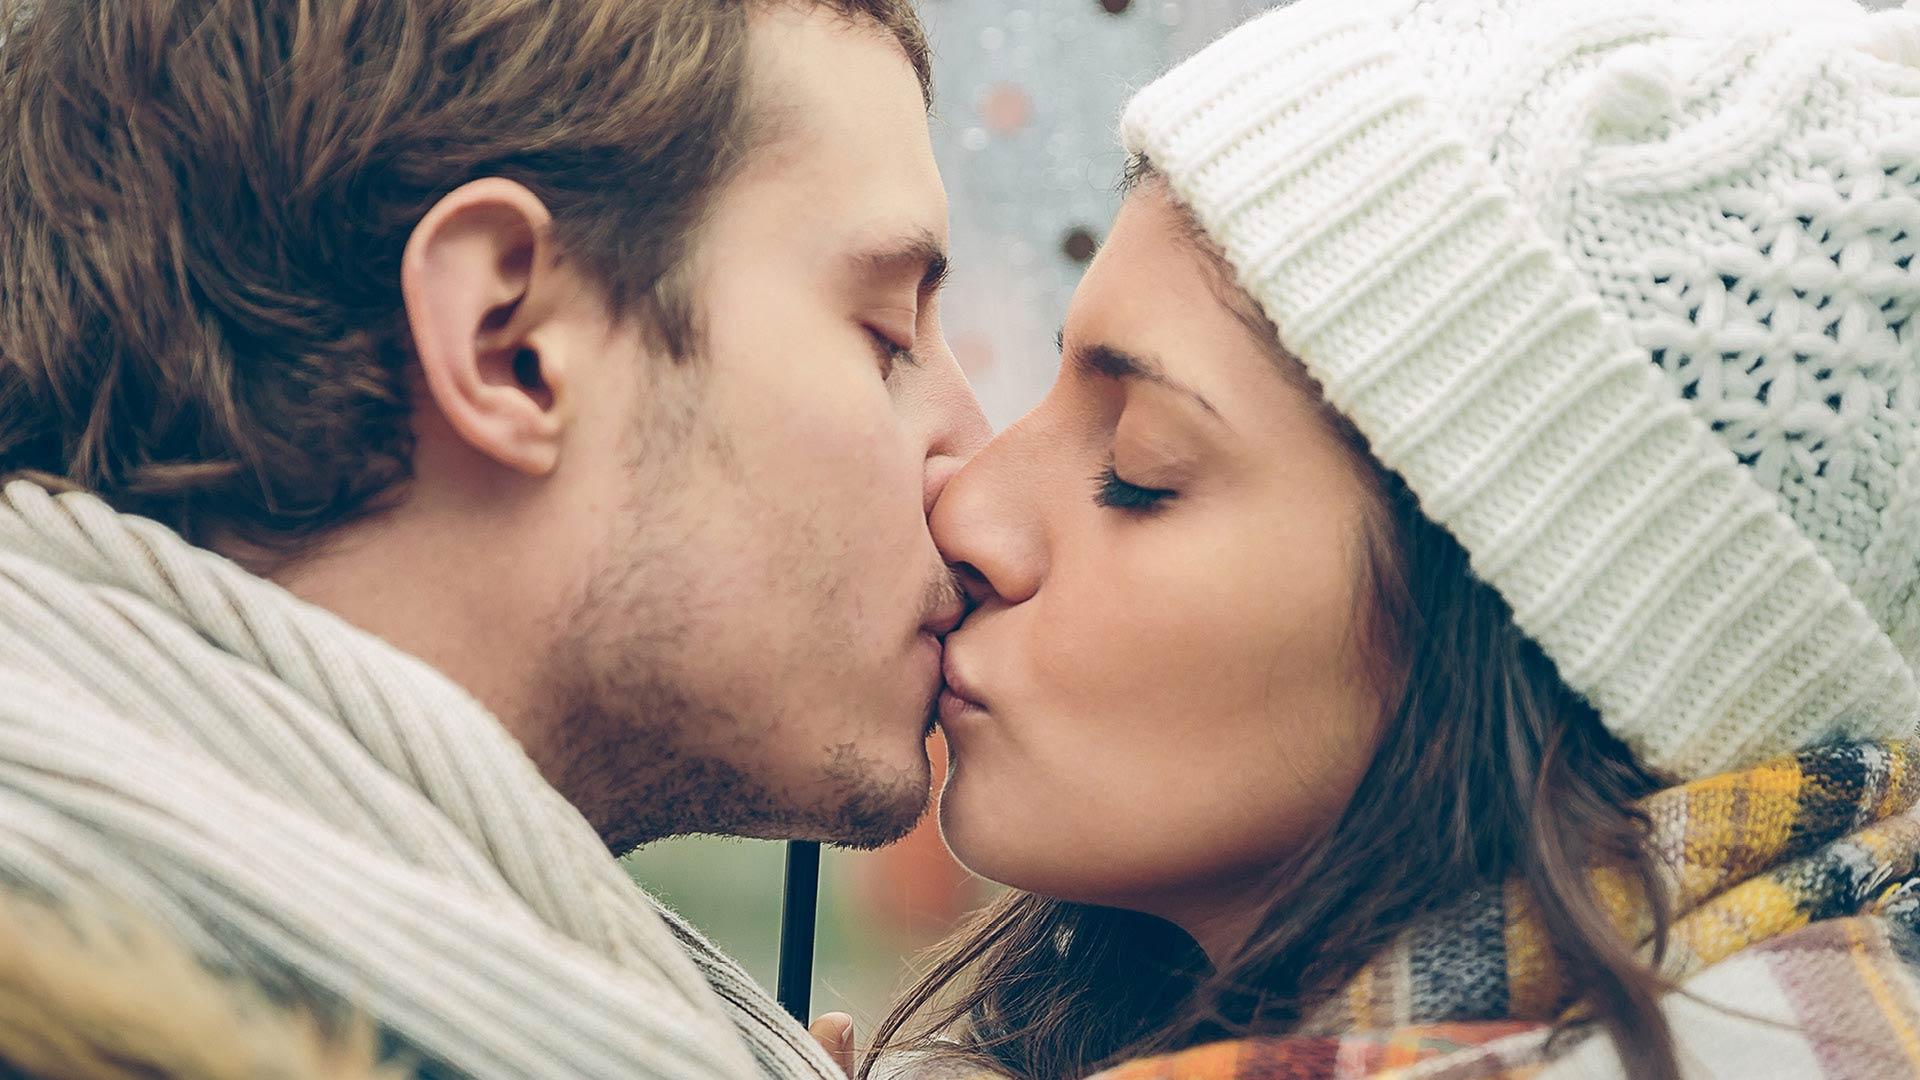 sociale medier massage kysse